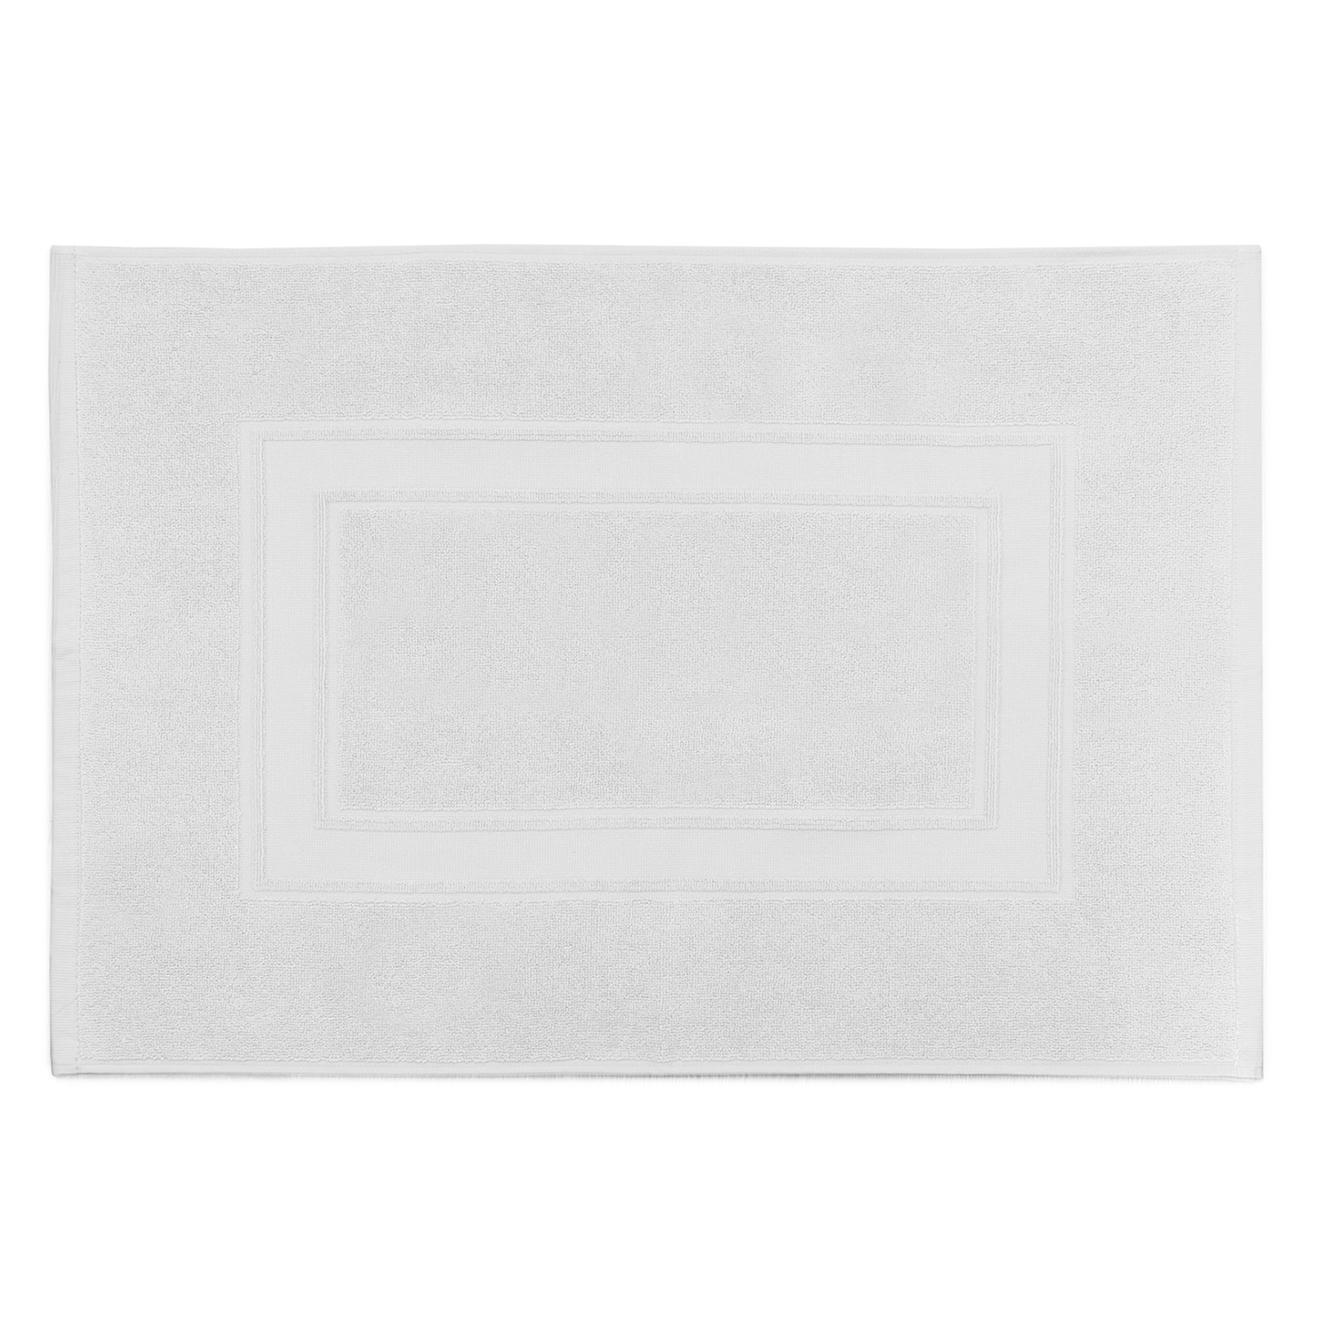 Tapis de bain Elisa blanc - 50x70 cm